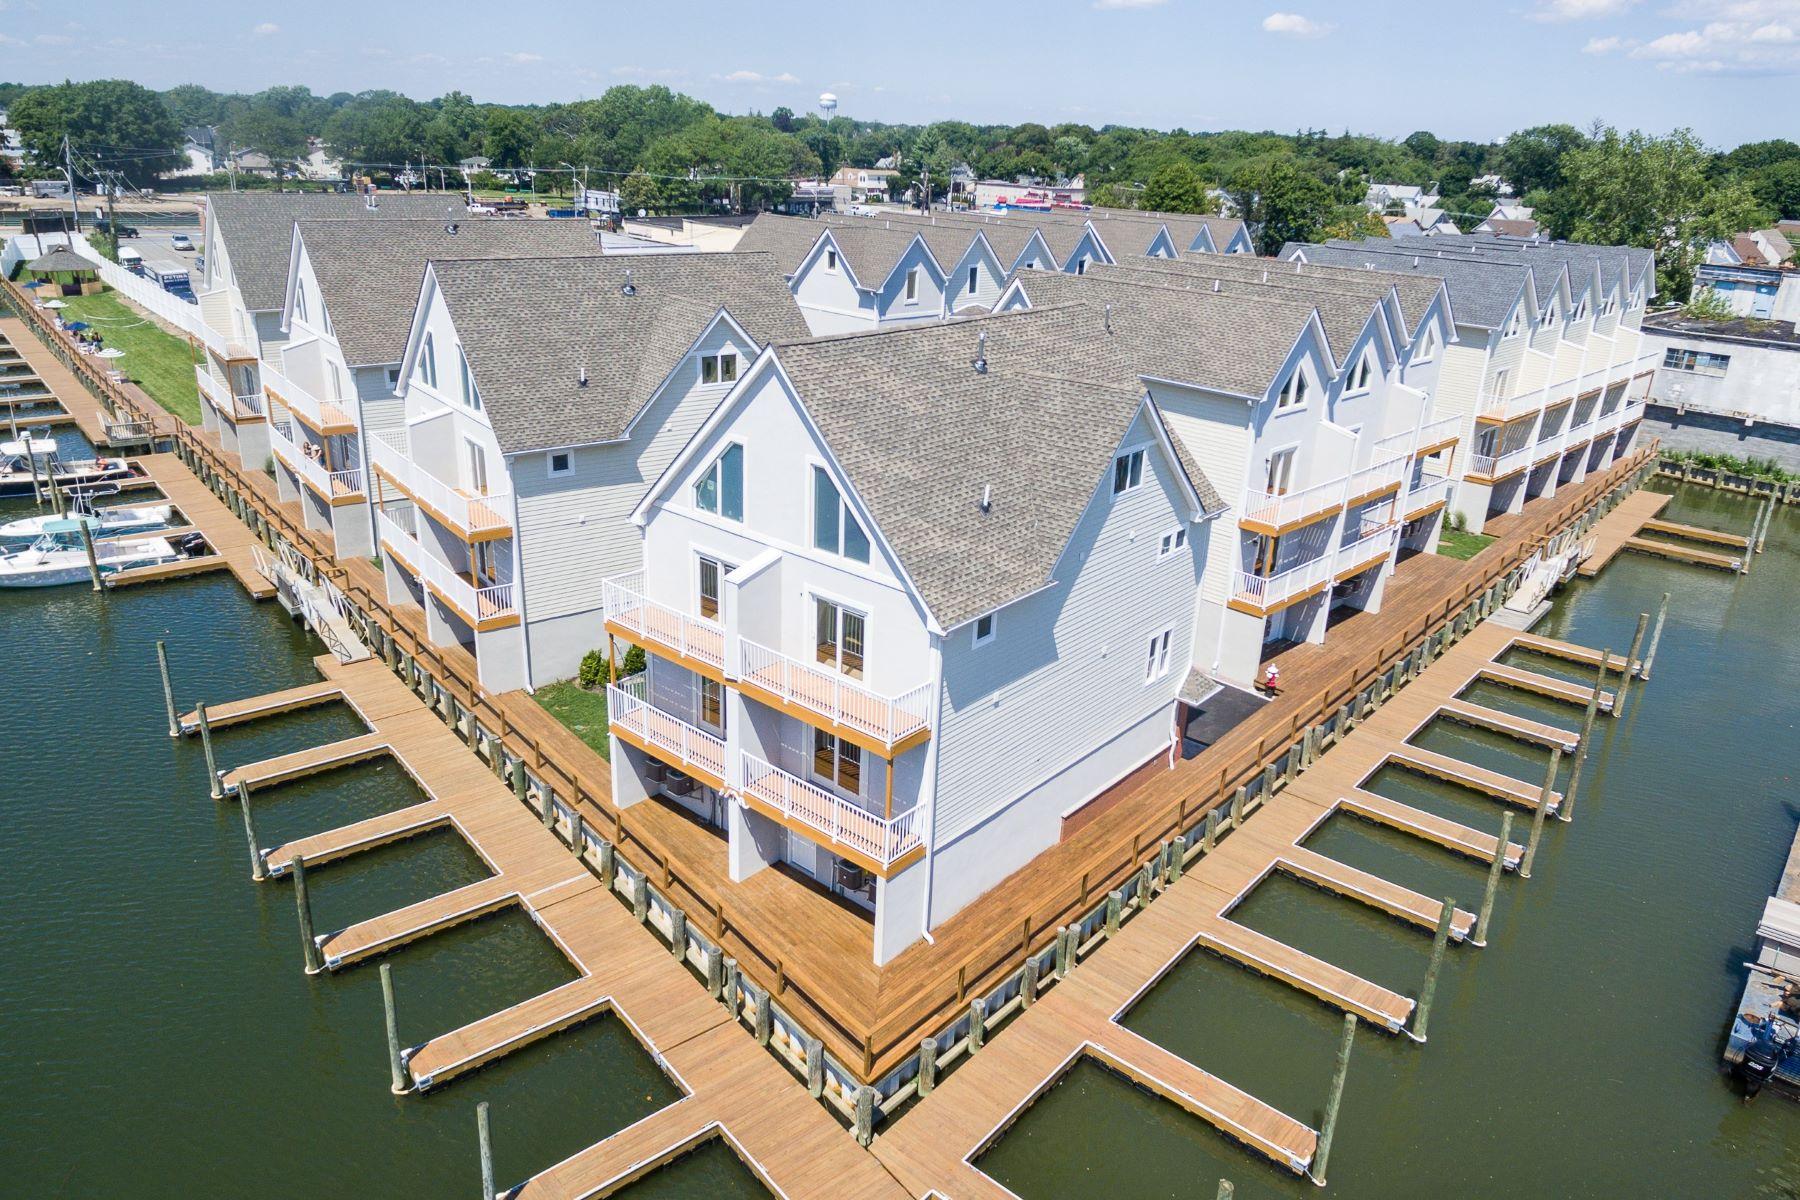 Condominium for Sale at Condo 531 Ray St 5 Freeport, New York 11520 United States